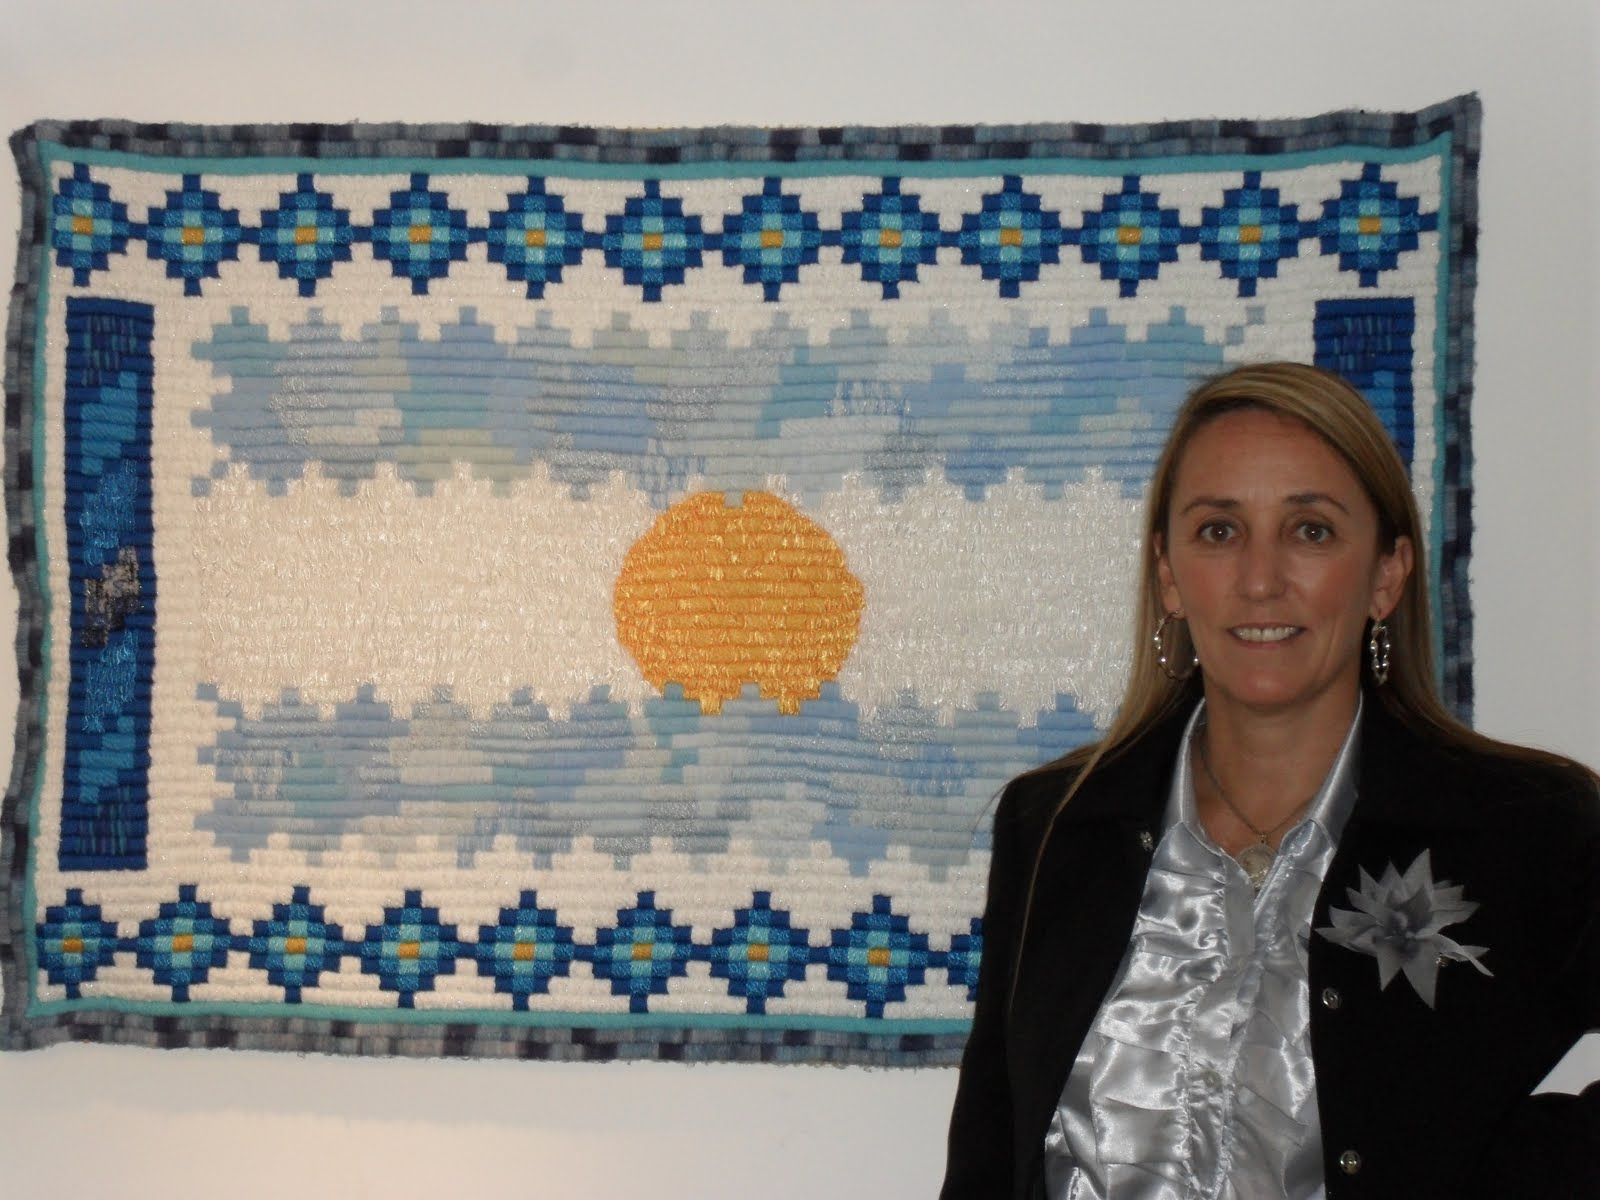 Mariana mai arte textil decoraci n y dise o julio 2011 for Decoracion 9 de julio pinterest